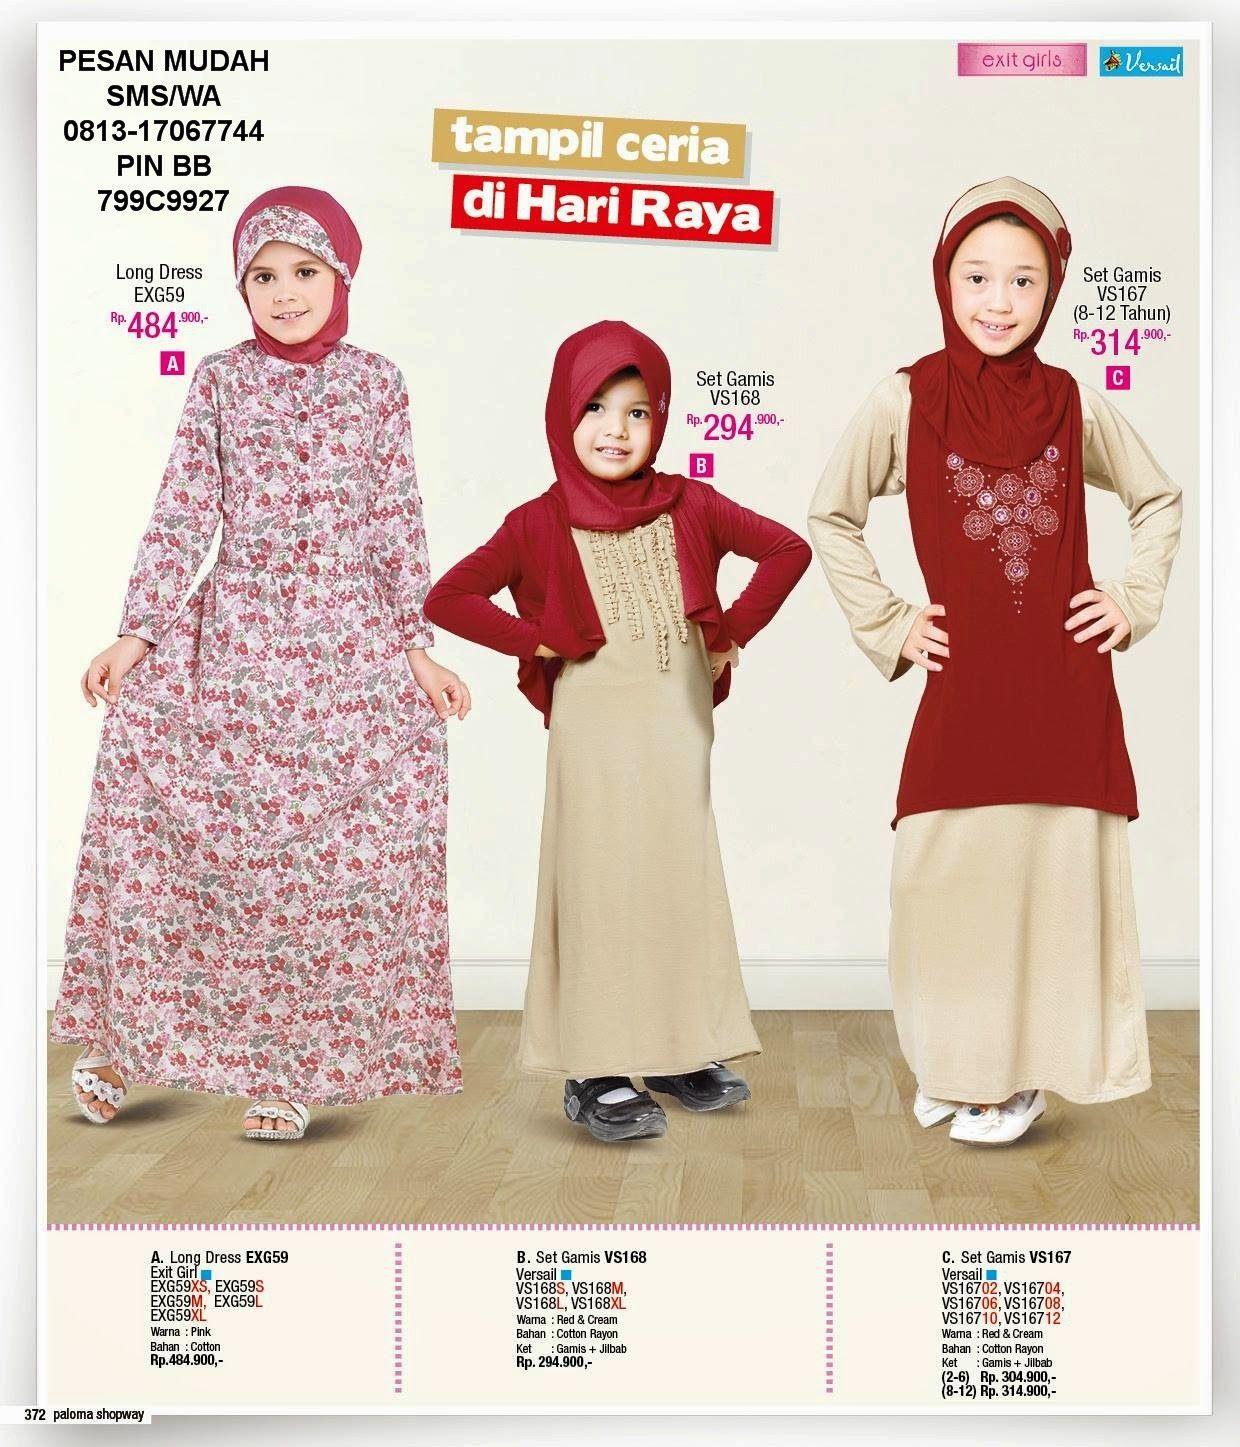 Butik Paloma Shopway Jakarta Barat Hotline 0813 17067744 Gamis Long Dress Anak Pretty Girl